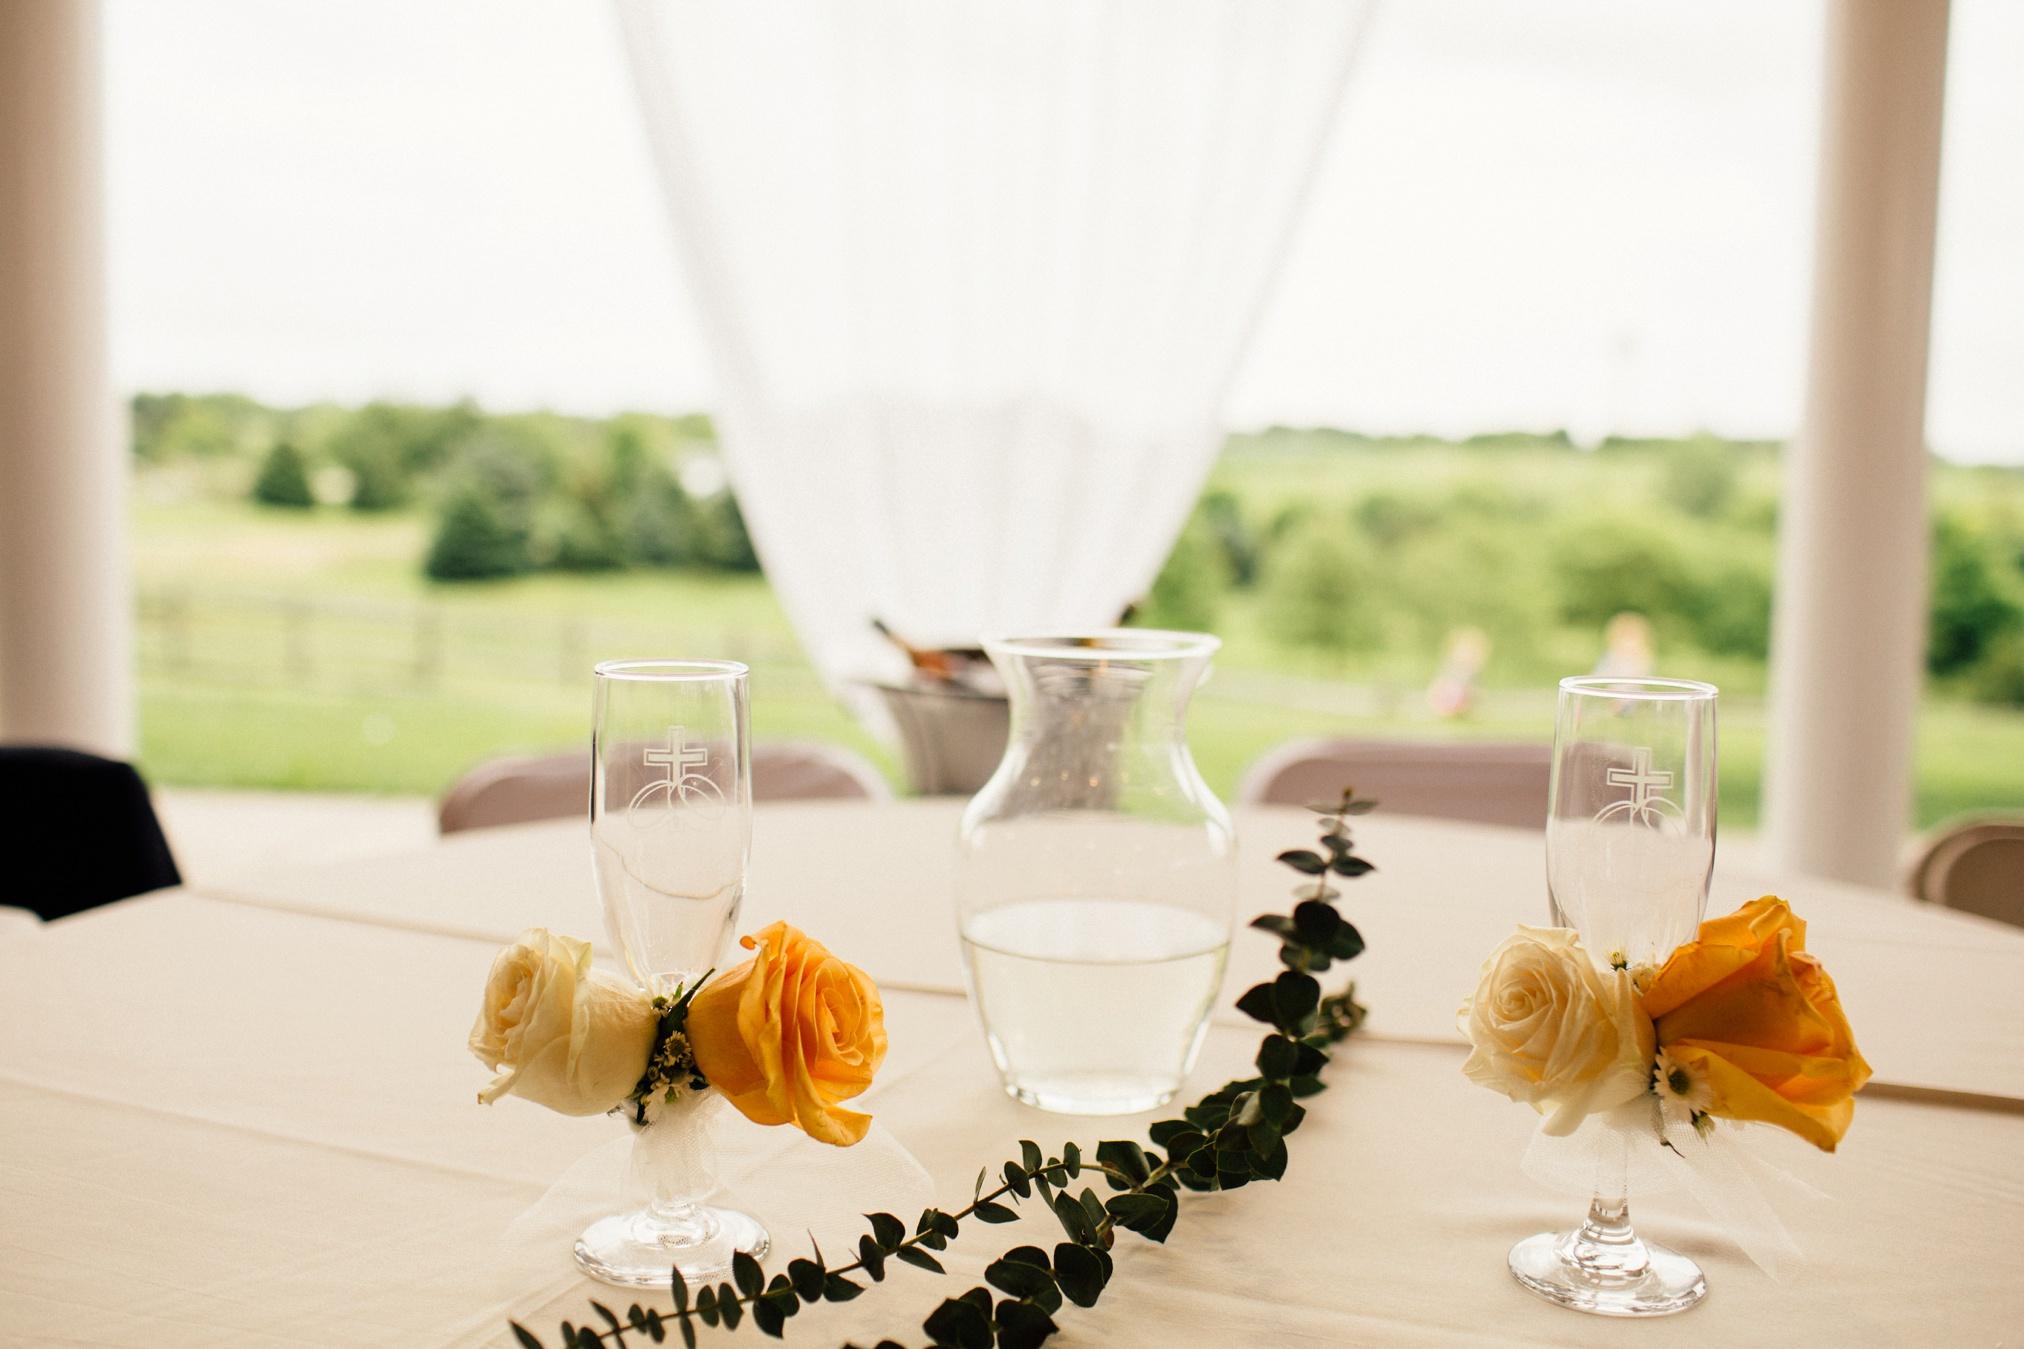 schmid_wedding-670.jpg